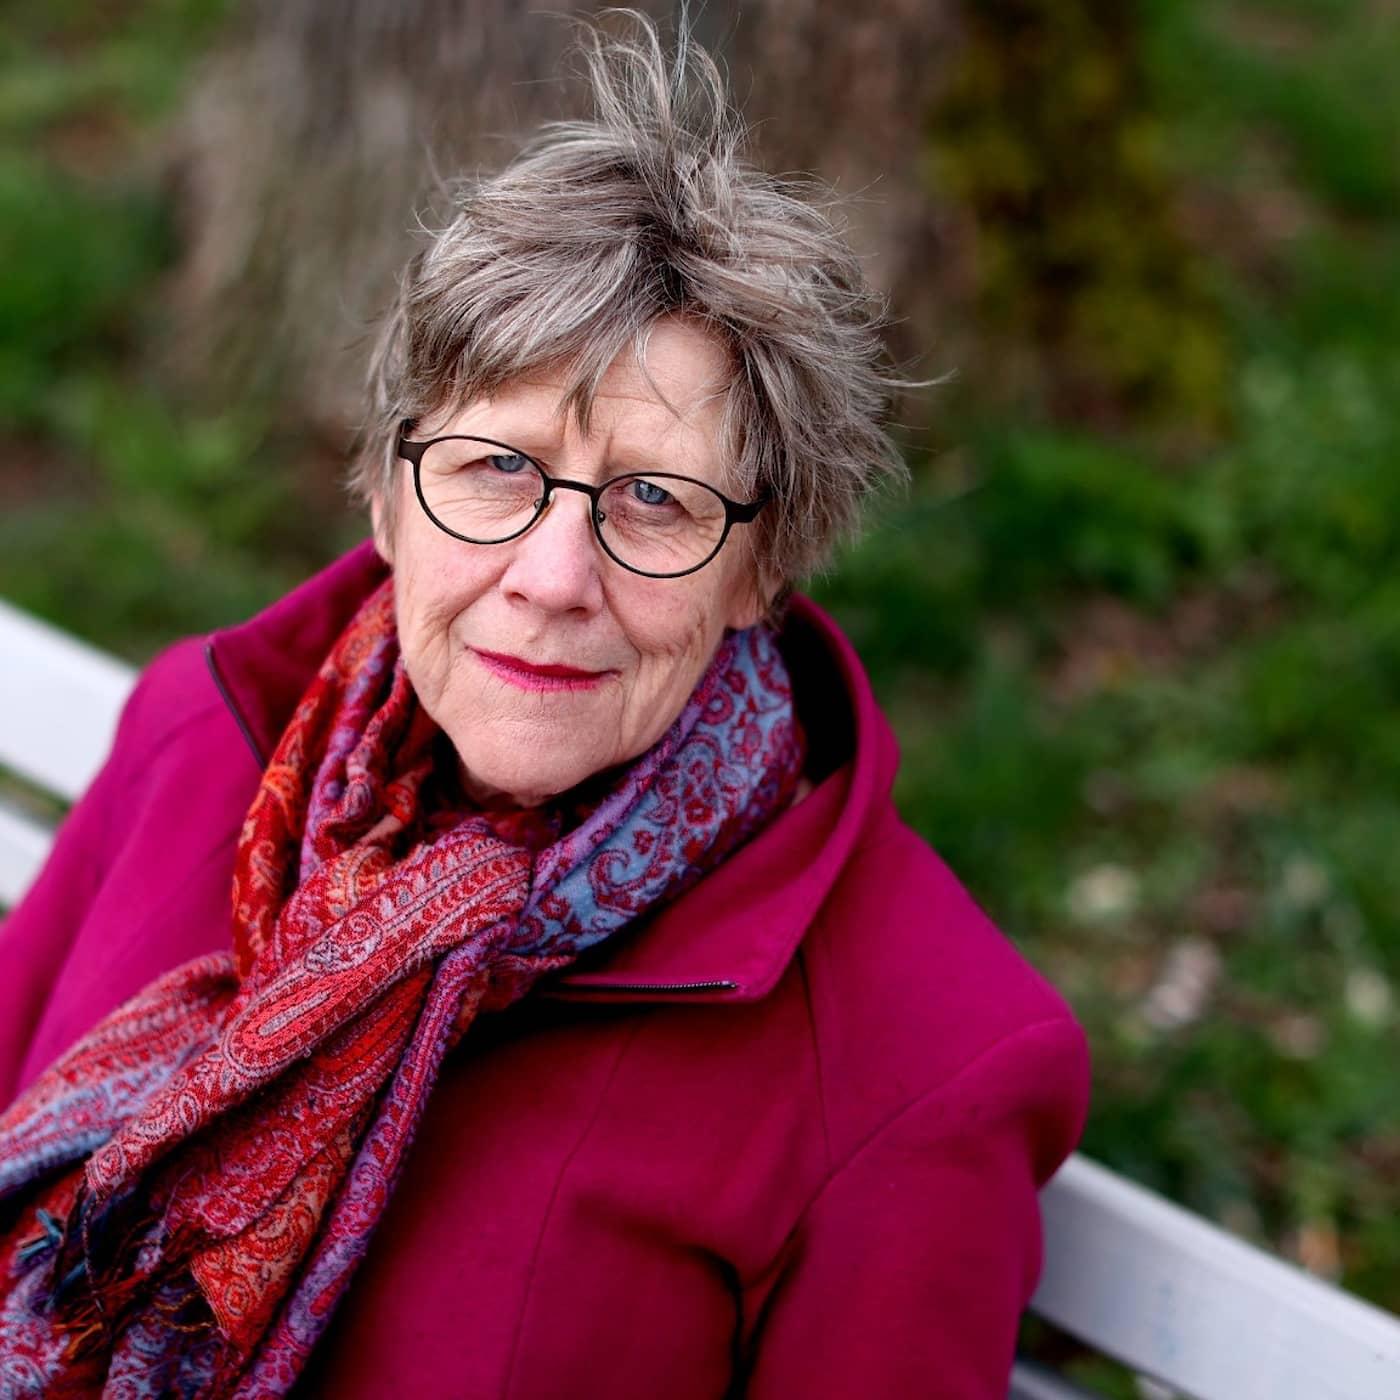 Agnes Wold: Så kan ni umgås trots corona